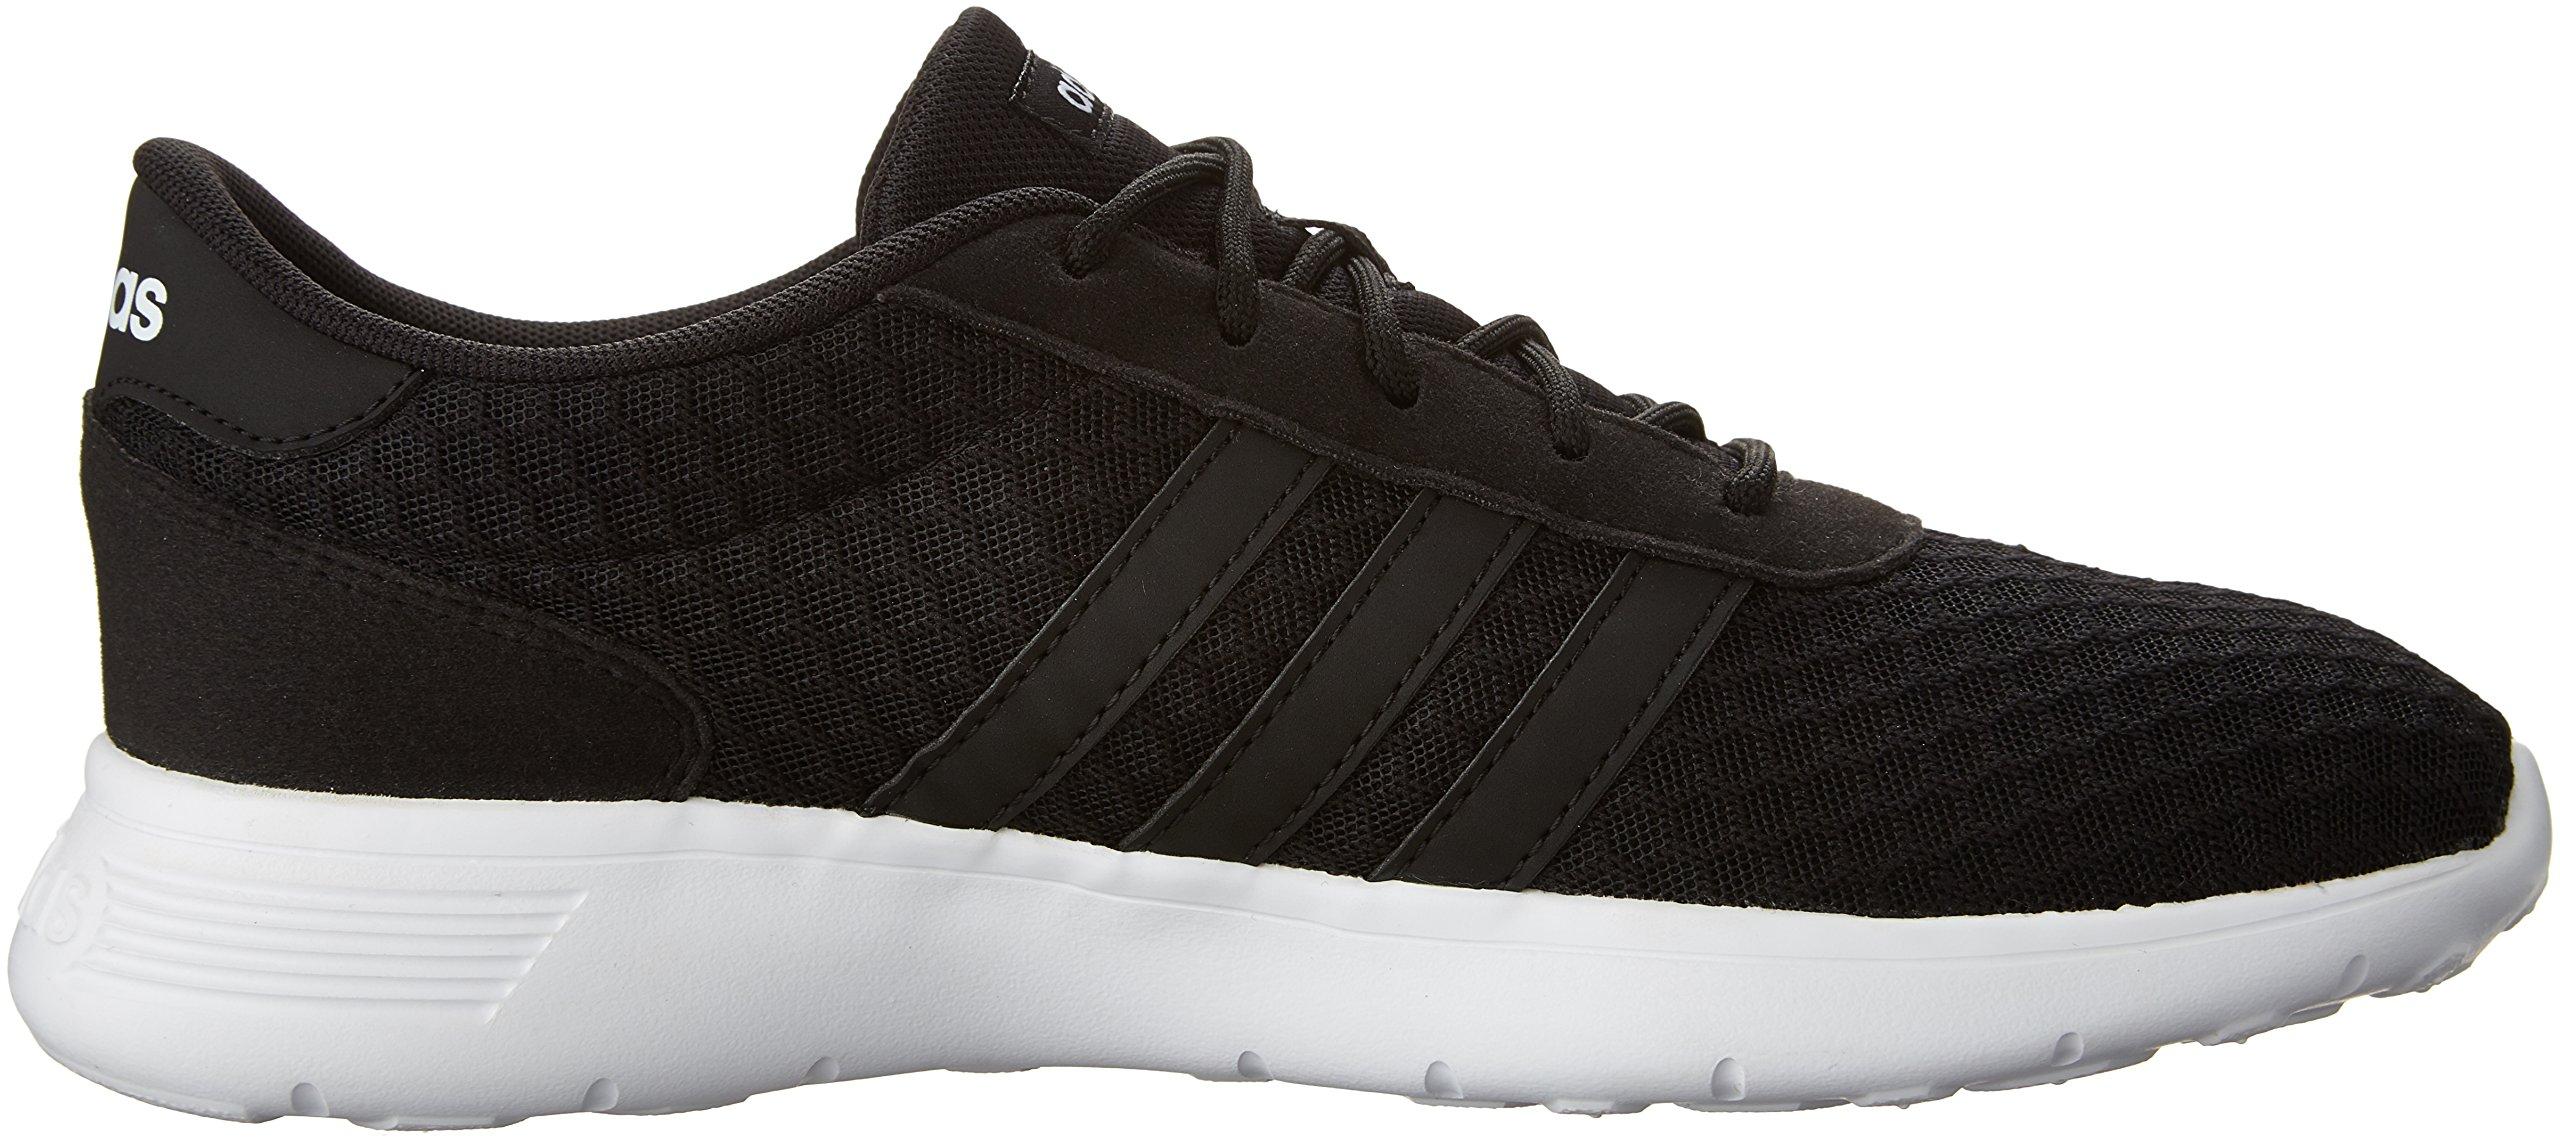 adidas Women's Lite Racer W Sneaker, Black/White, 8.5 M US by adidas (Image #7)